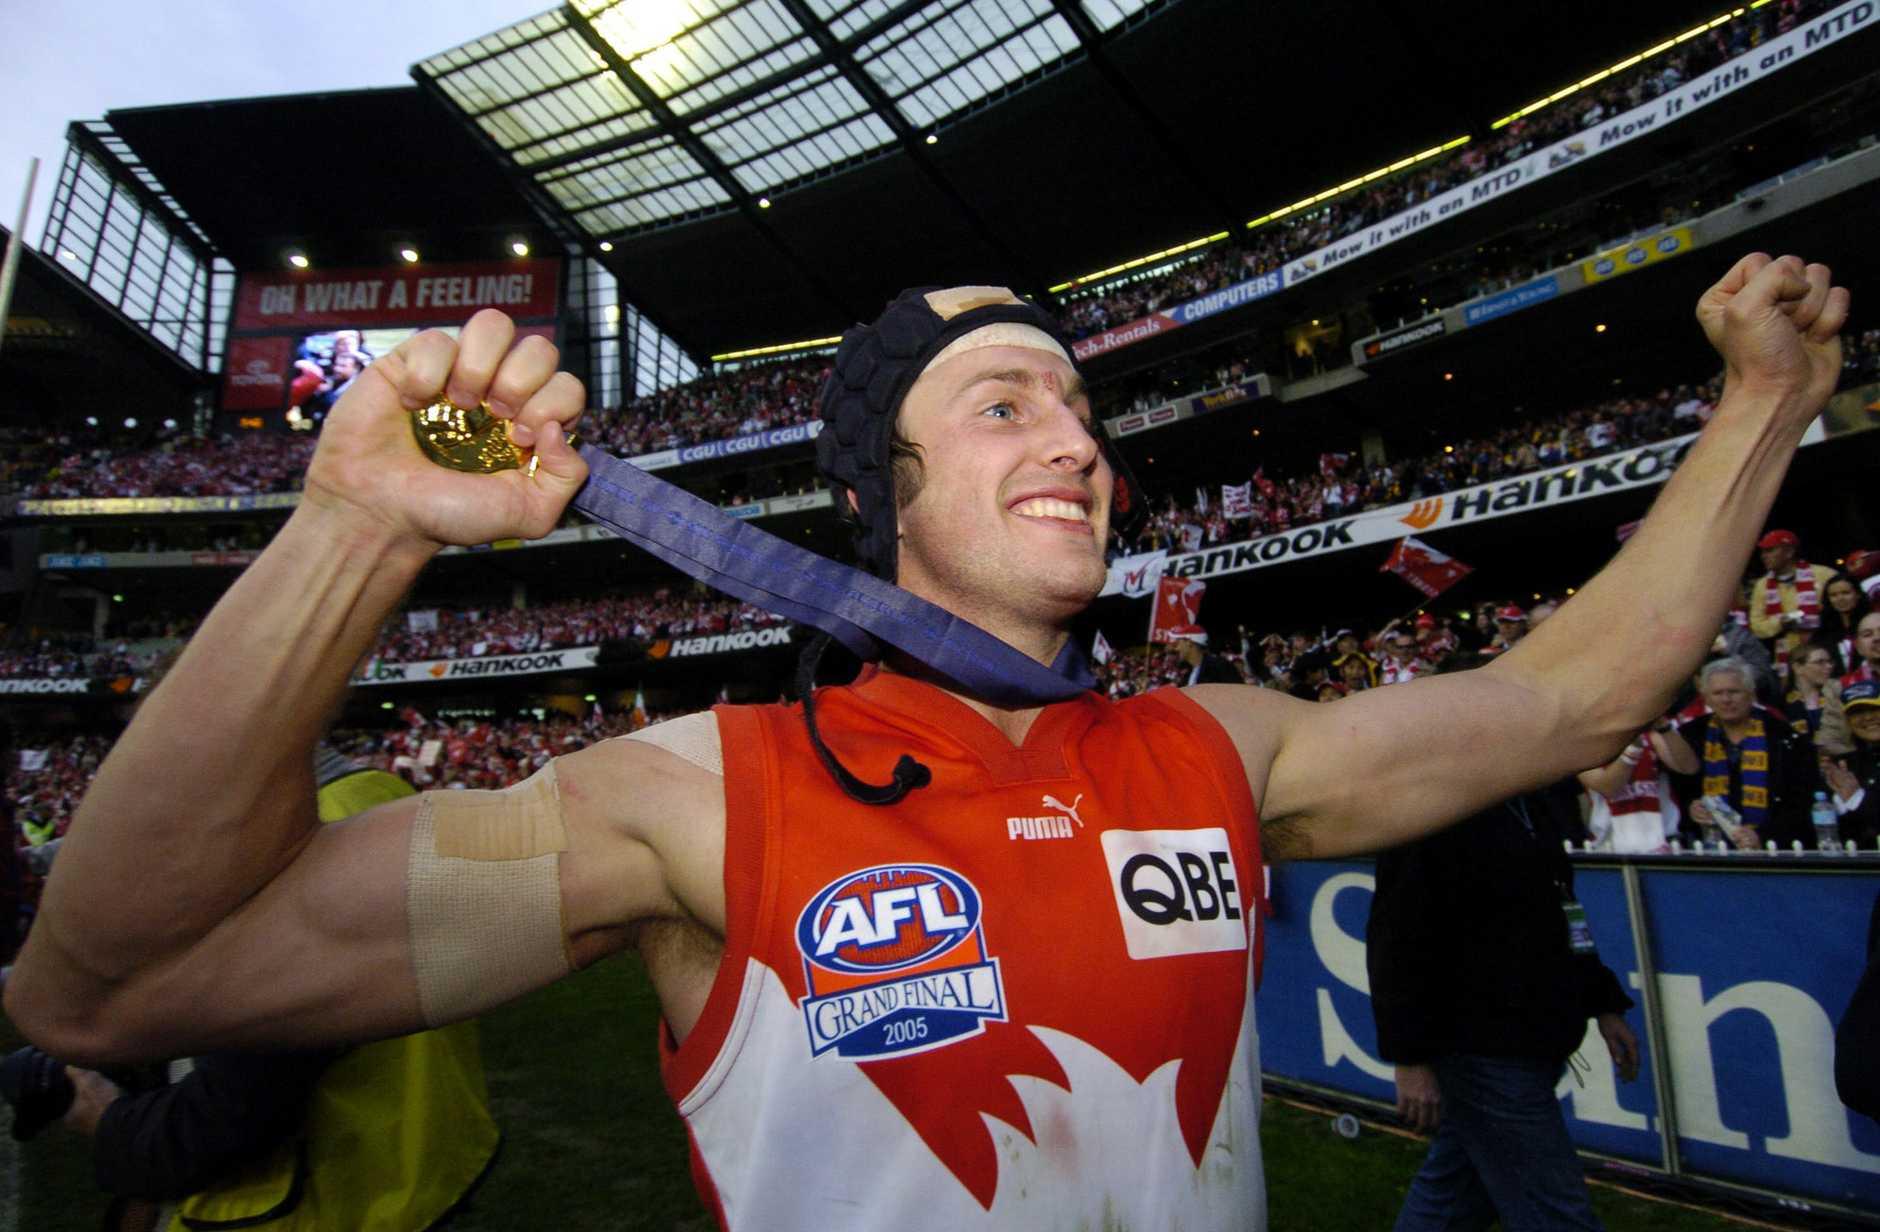 Jude Bolton celebrates Sydney's success in 2005.